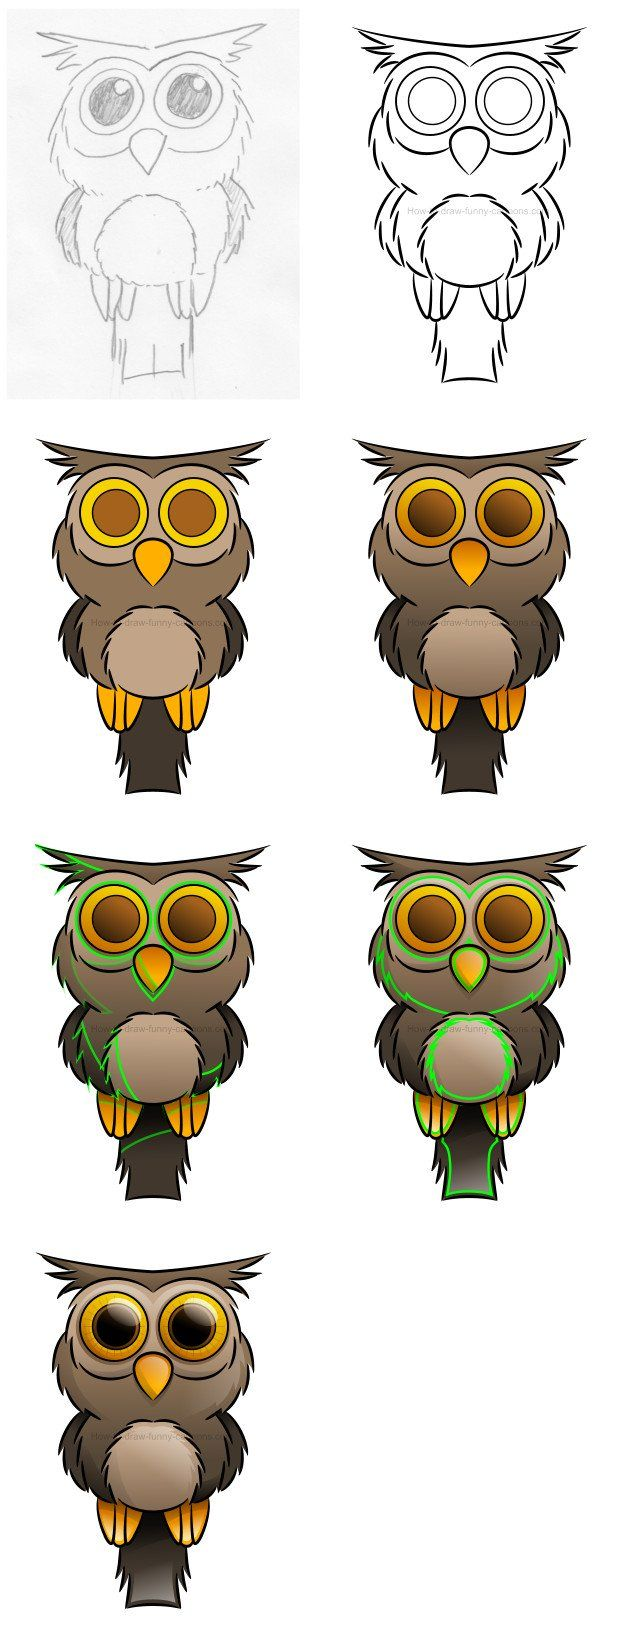 How to draw an owl with big large cartoon eyes. :) #howtodraw #cartoonowl #drawinganowl